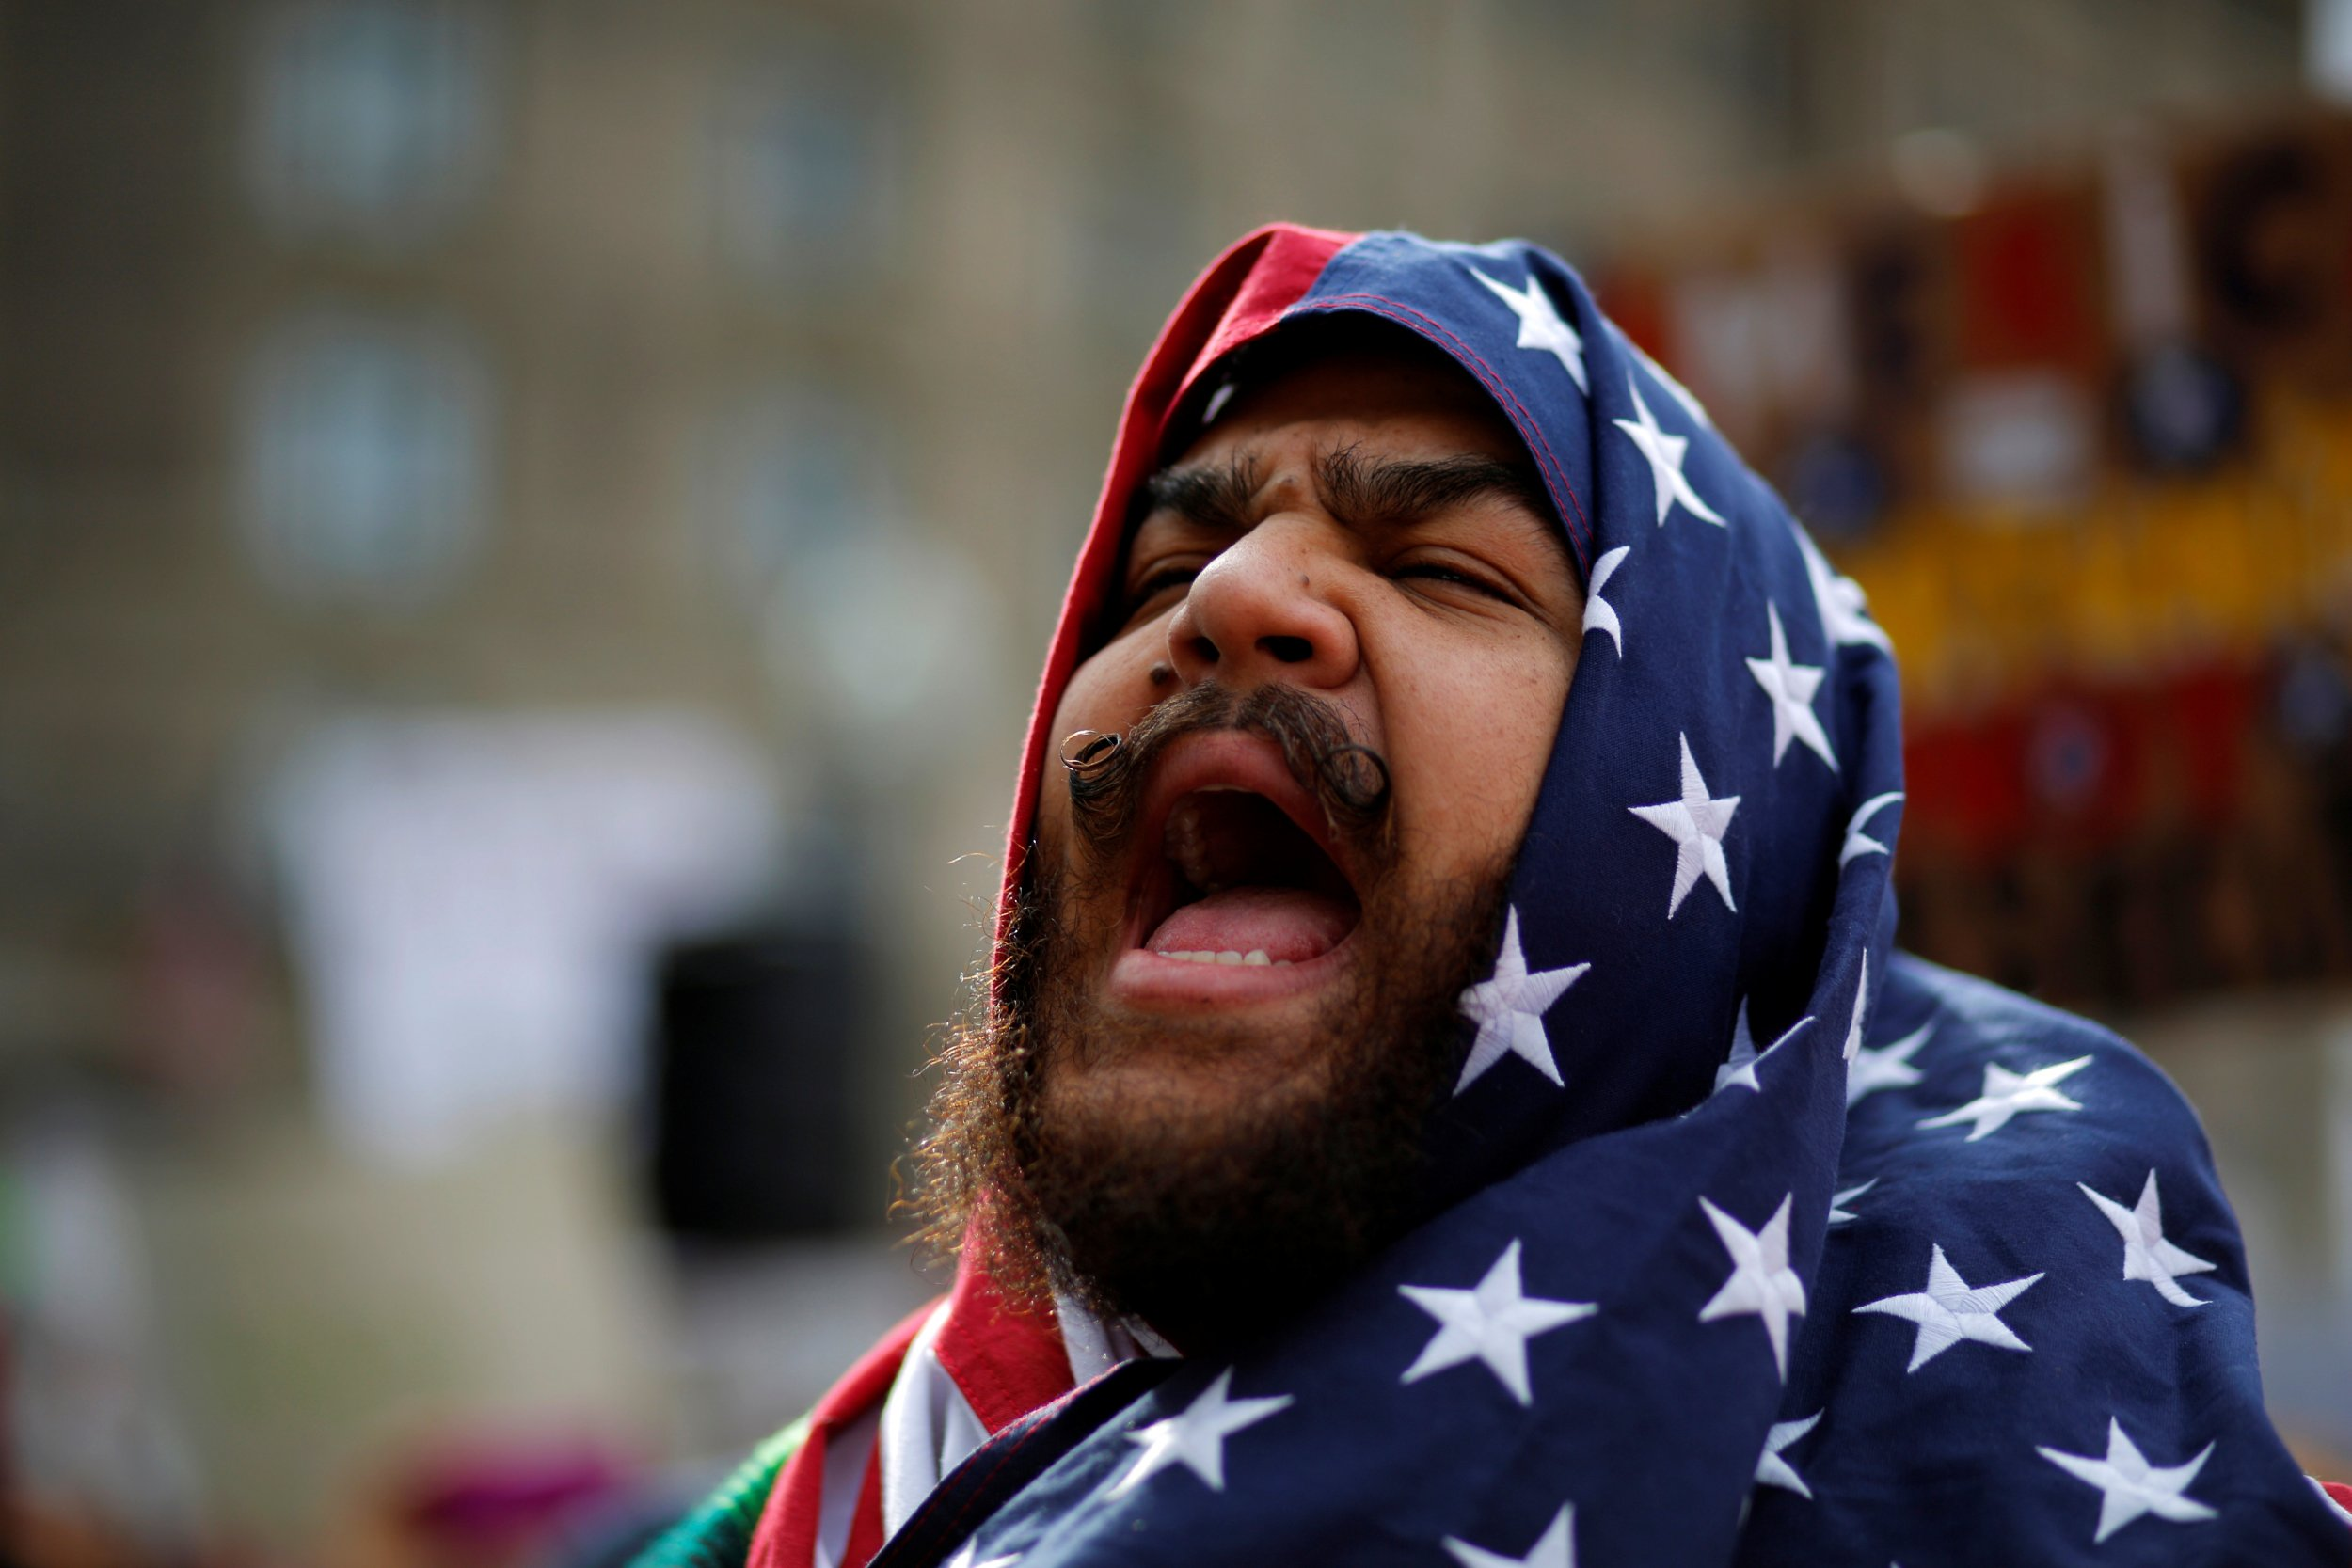 Boston Protest Against Muslim Ban 2017